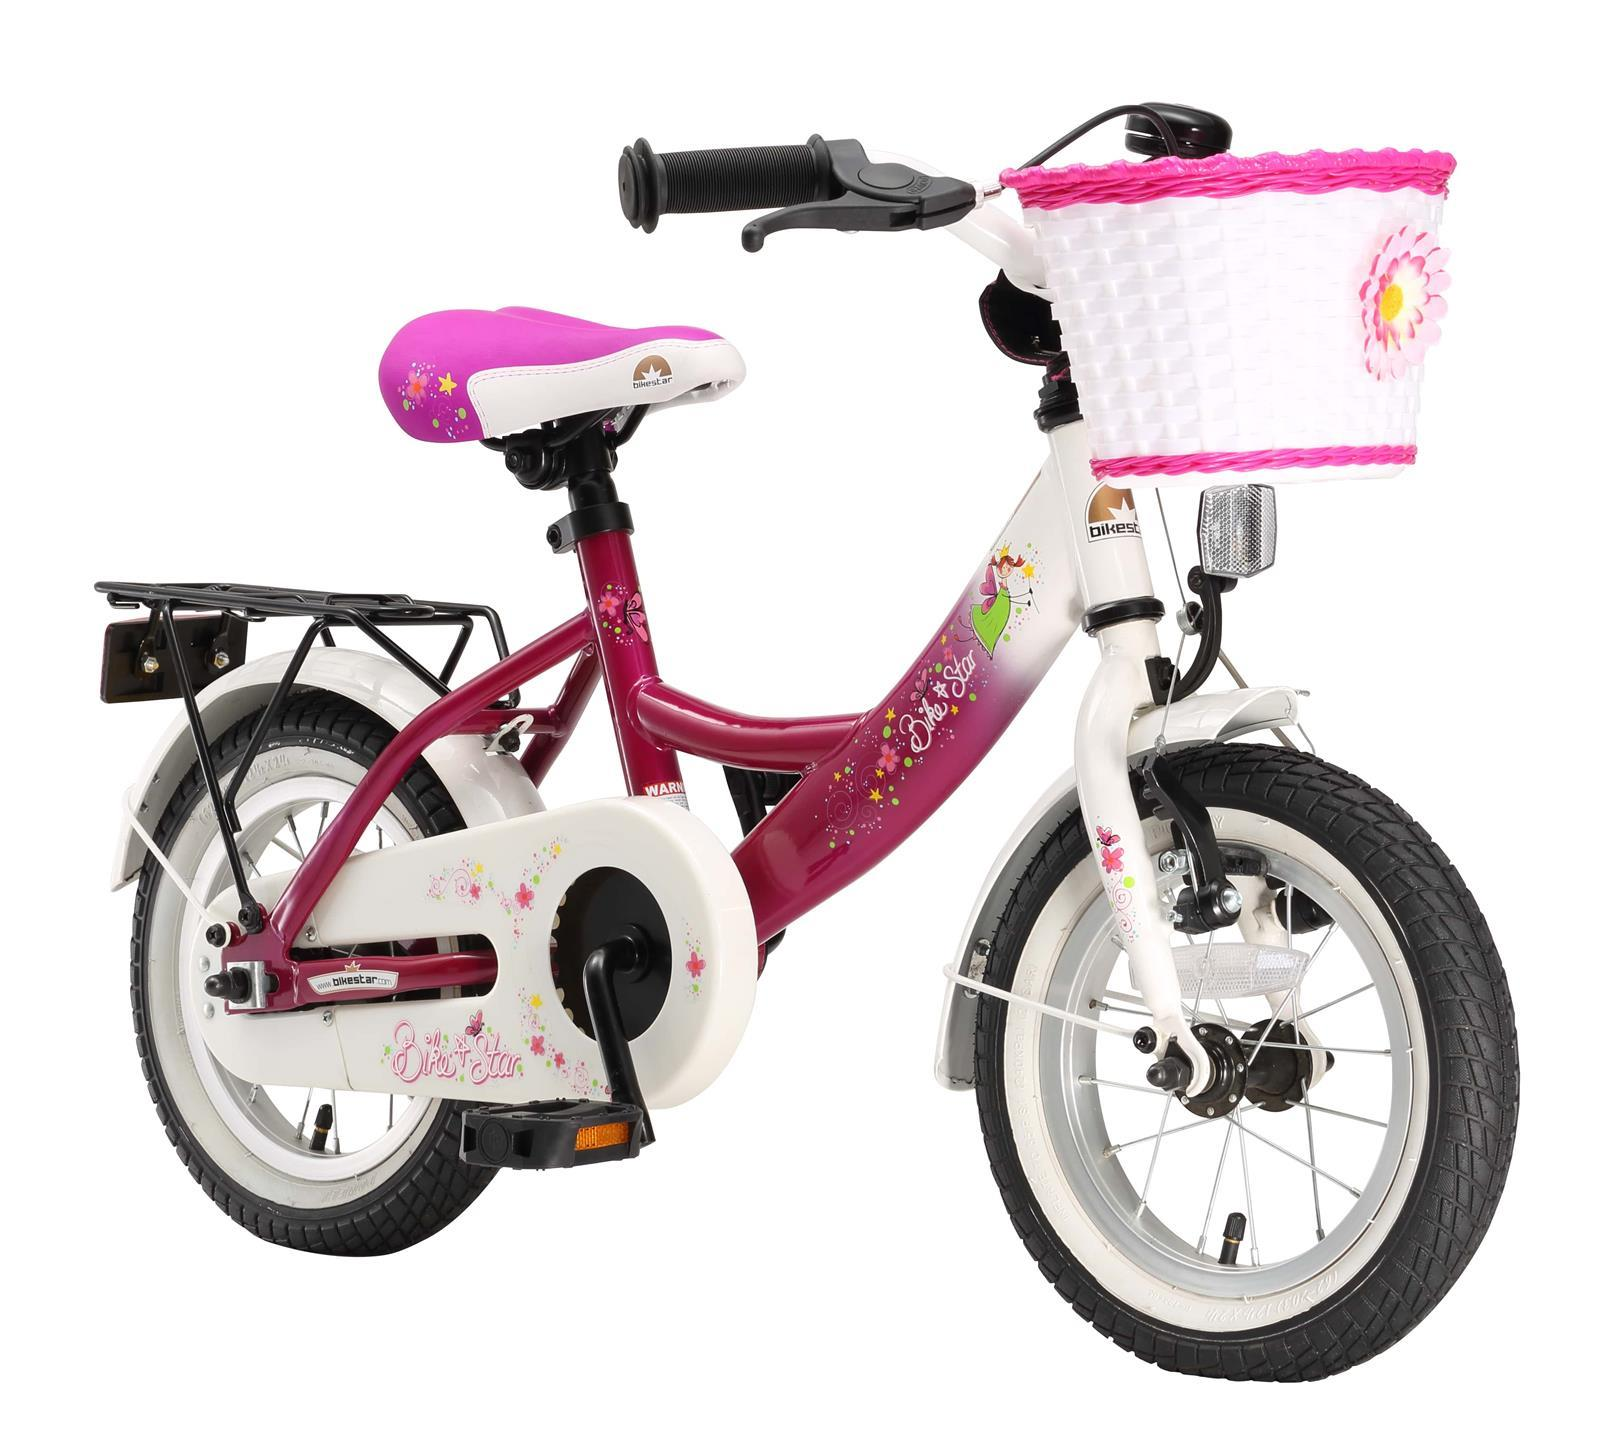 bi 12 kk 01 bywe bikestar 12 zoll kinderfahrrad berry fee design. Black Bedroom Furniture Sets. Home Design Ideas